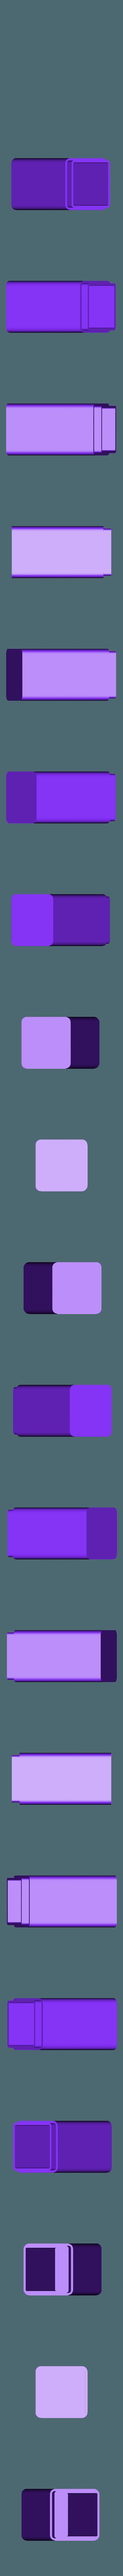 Boite-20x20x40-Dessous.stl Download STL file Storage box for model making 20 x 20 x 40 millimetres • 3D printable design, Almisuifre